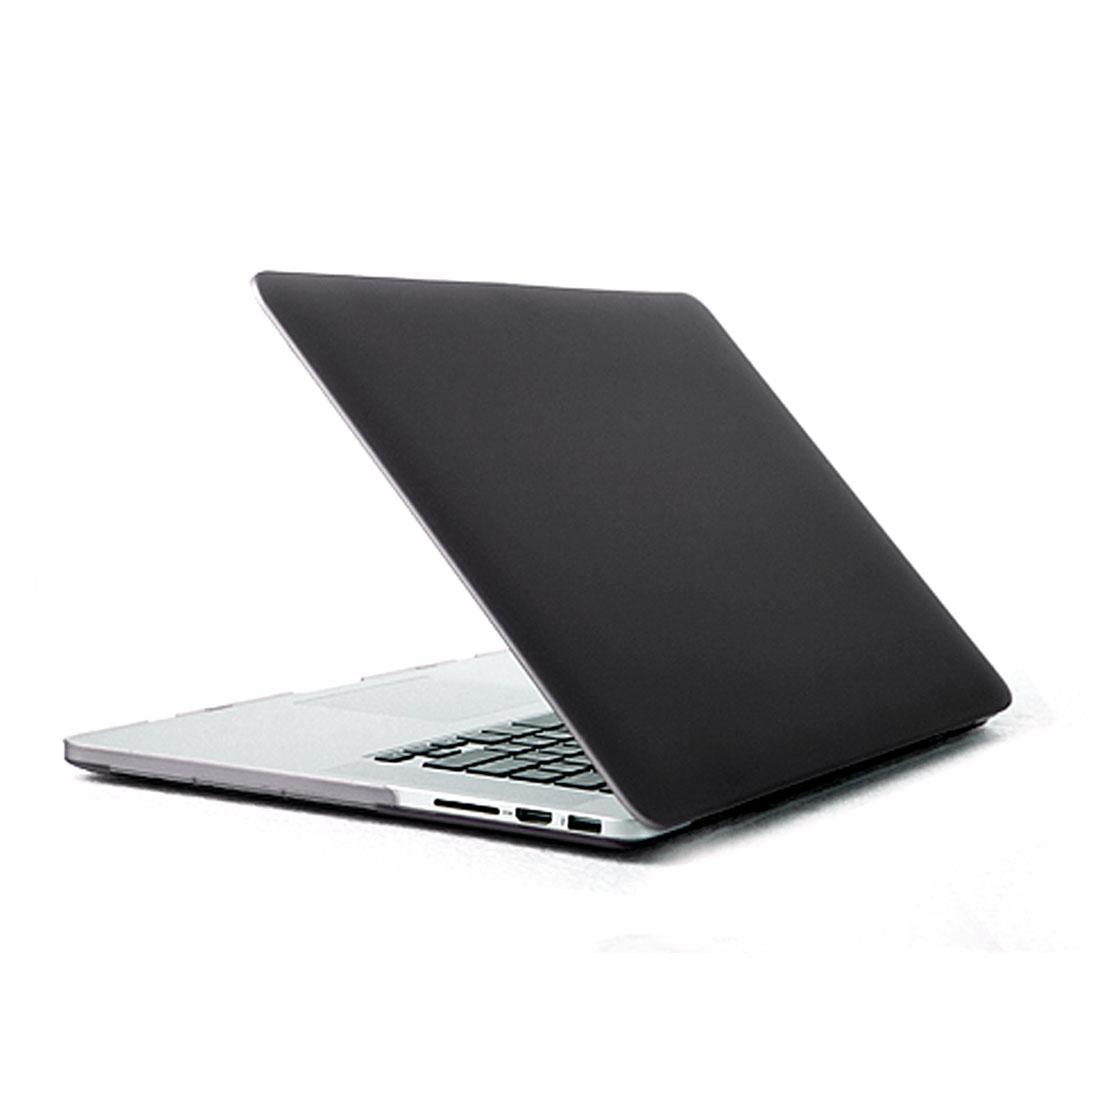 Plastic Hard Shell Cover Case Black for MacBook Pro 15 Inch Retina